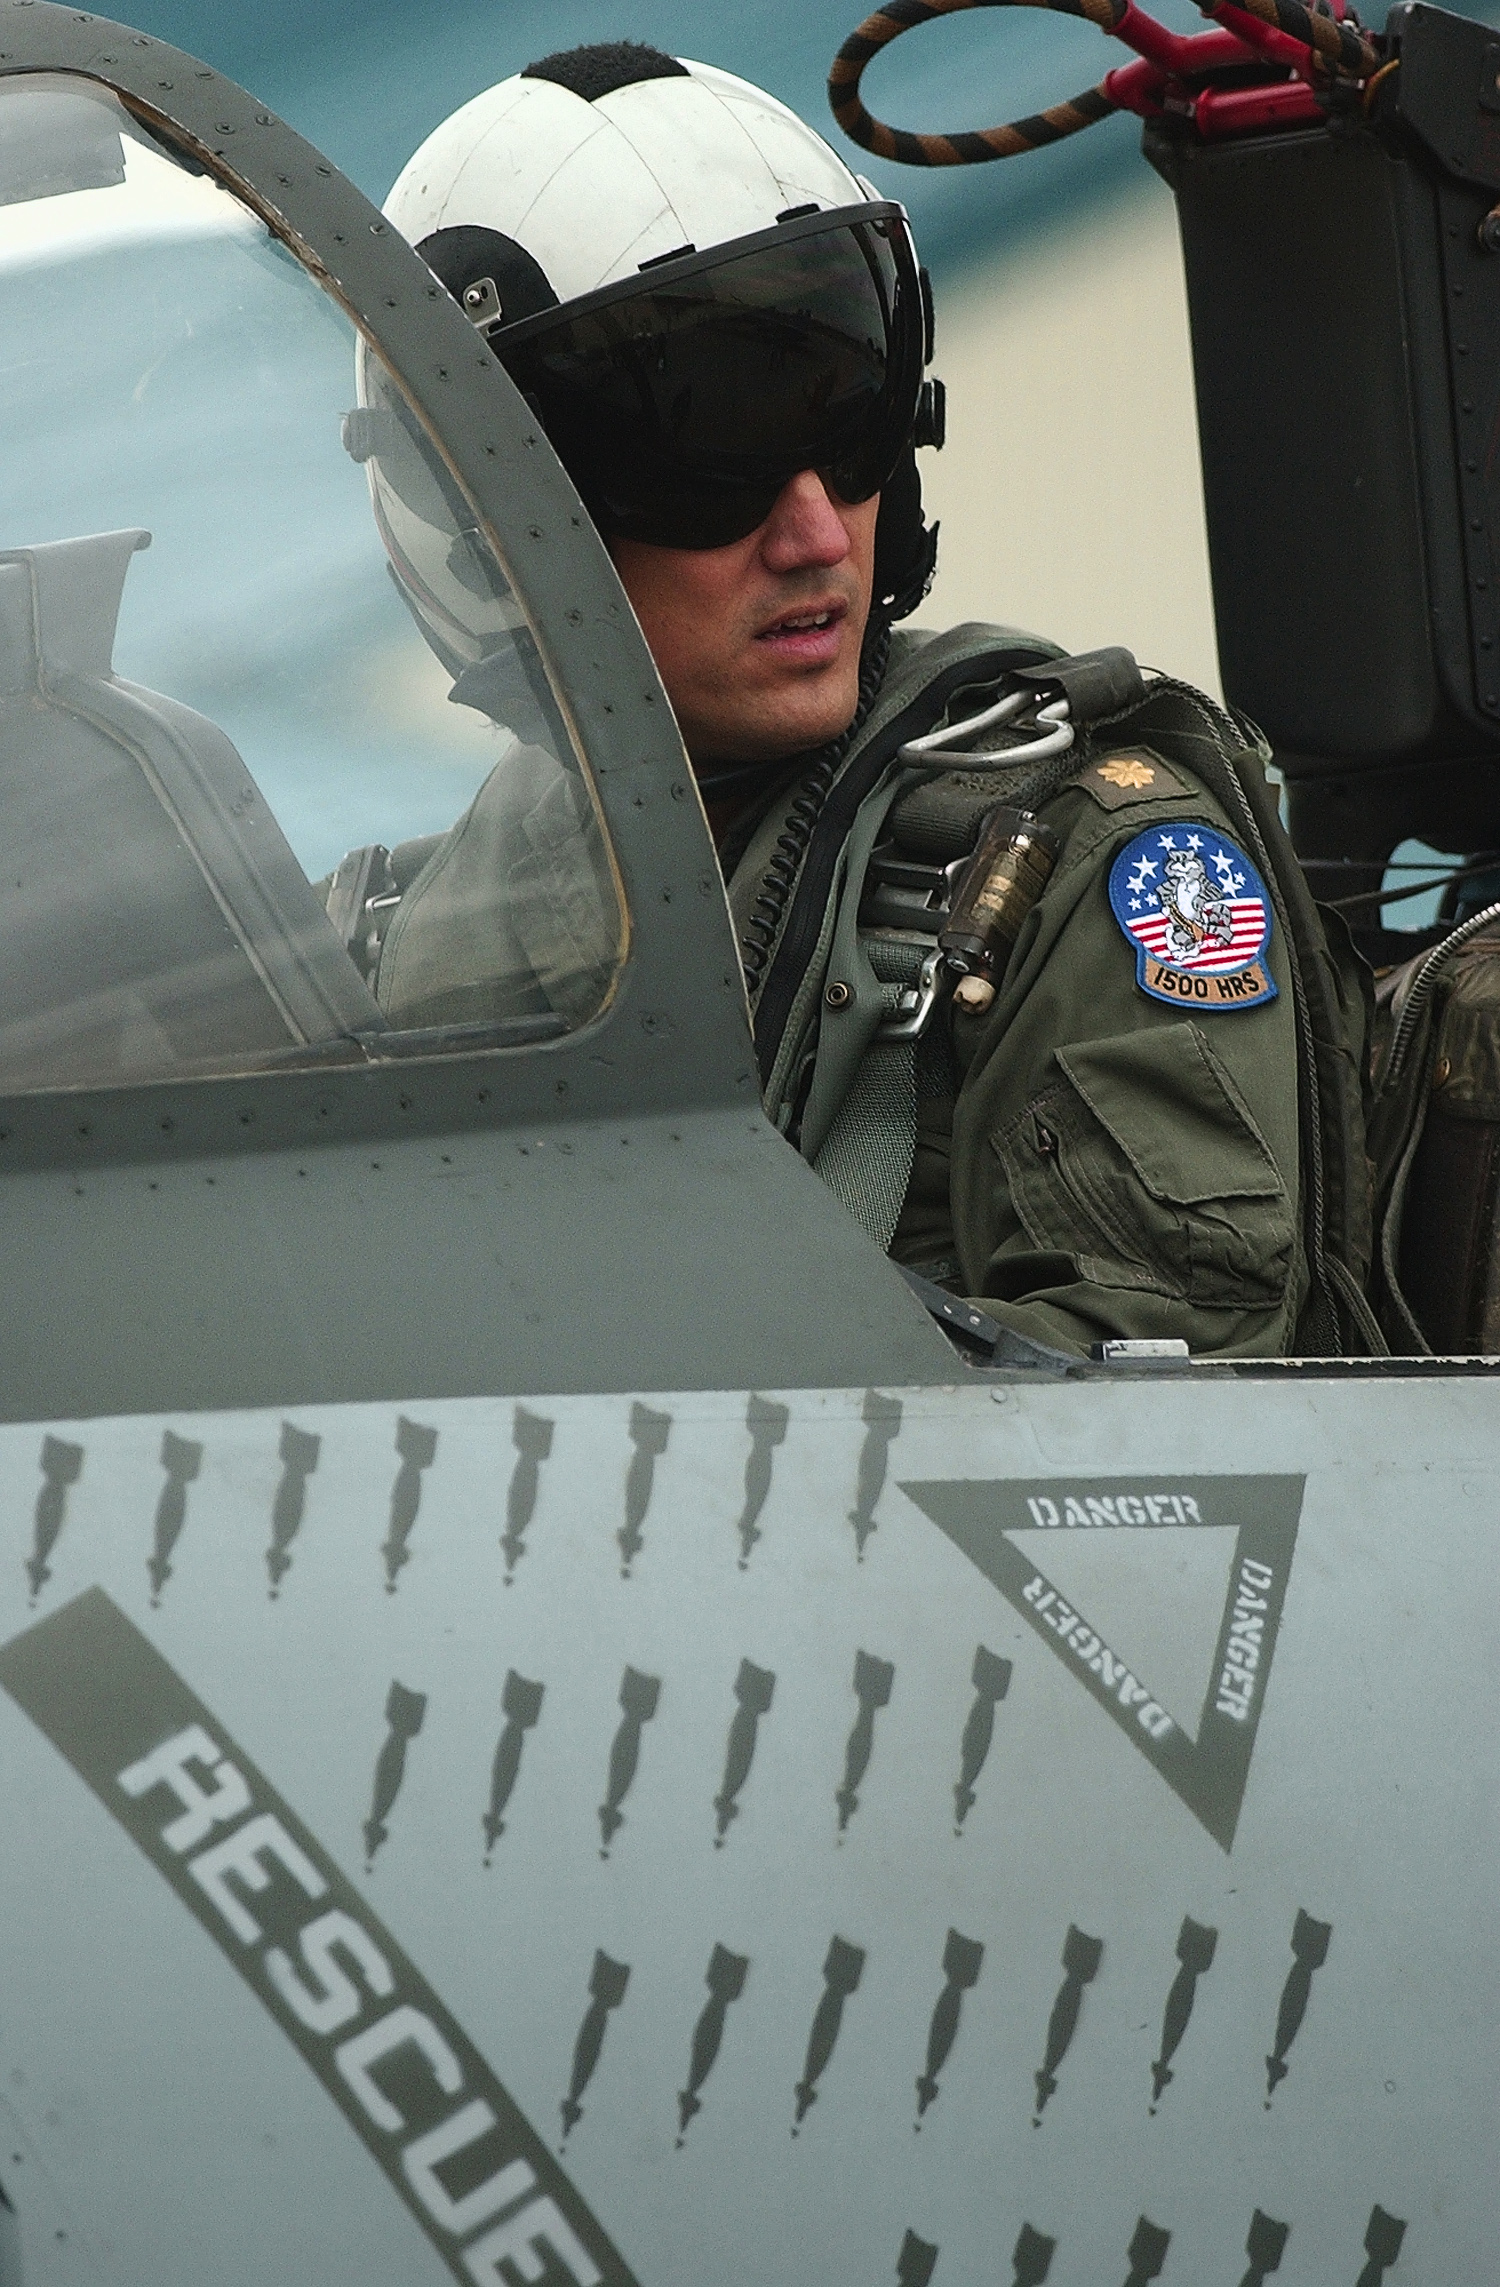 f 14 diagram file us navy 030924 n 9849w 001 an f 14 tomcat pilot m 14 diagram